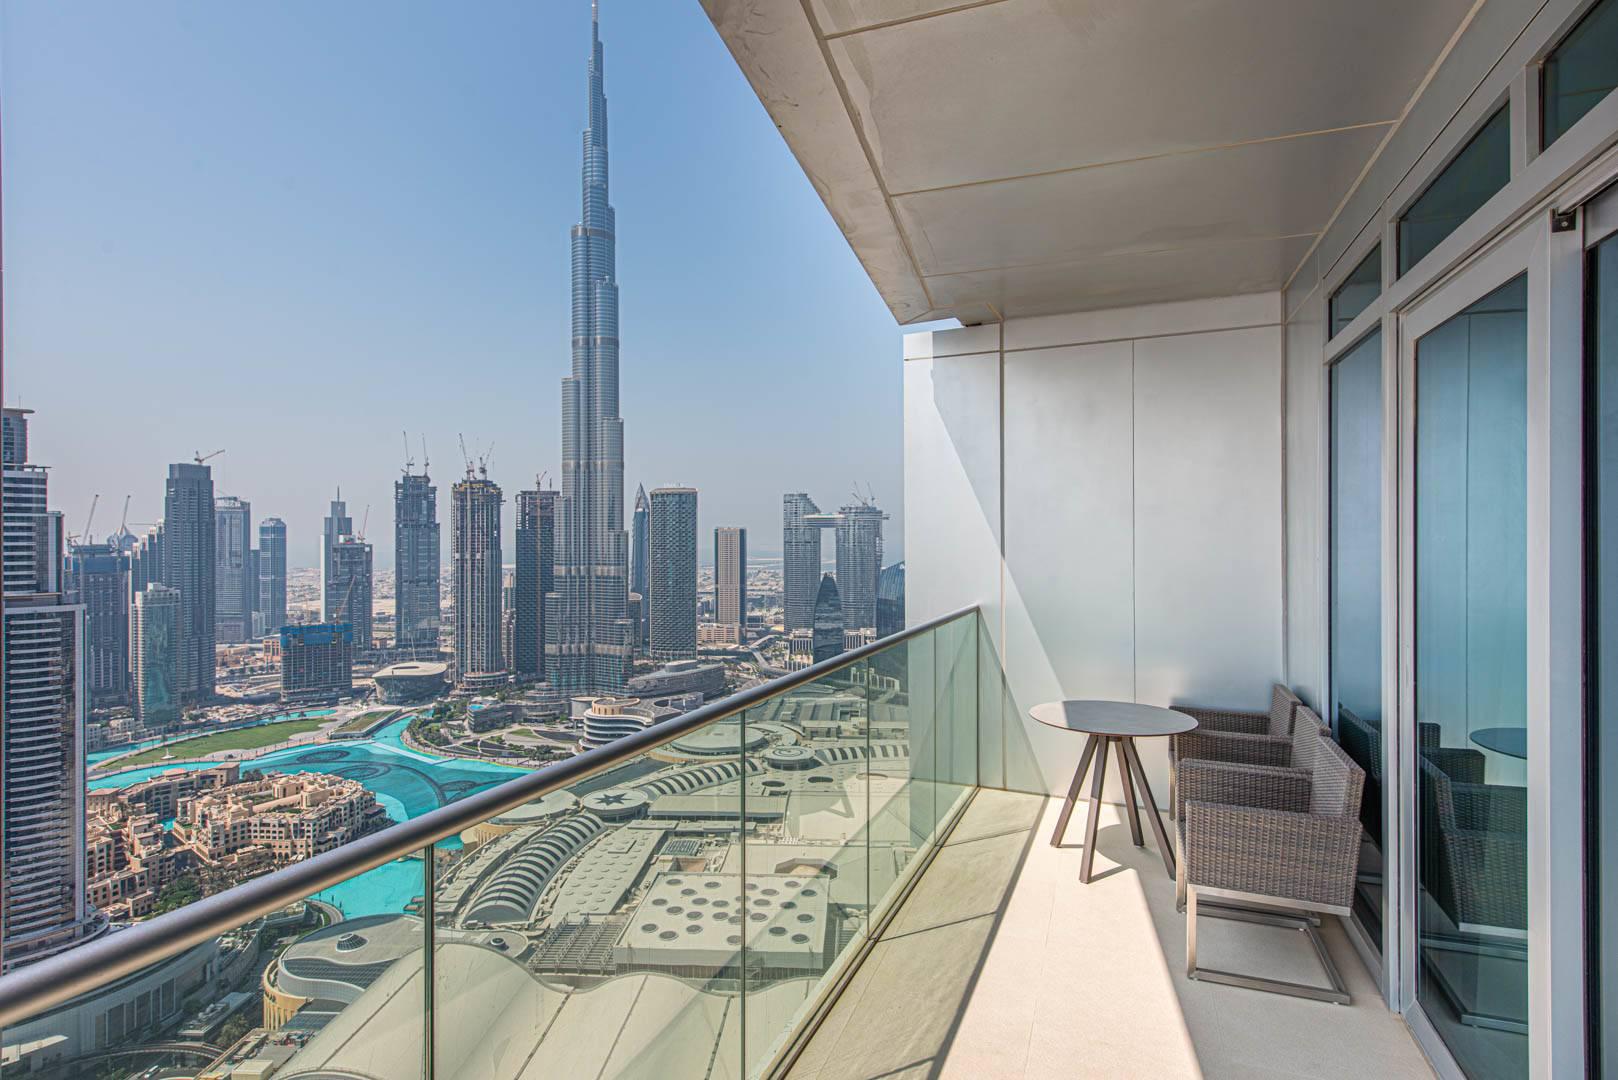 RENT in The Address Residence Fountain Views 1-Dubai-UAE